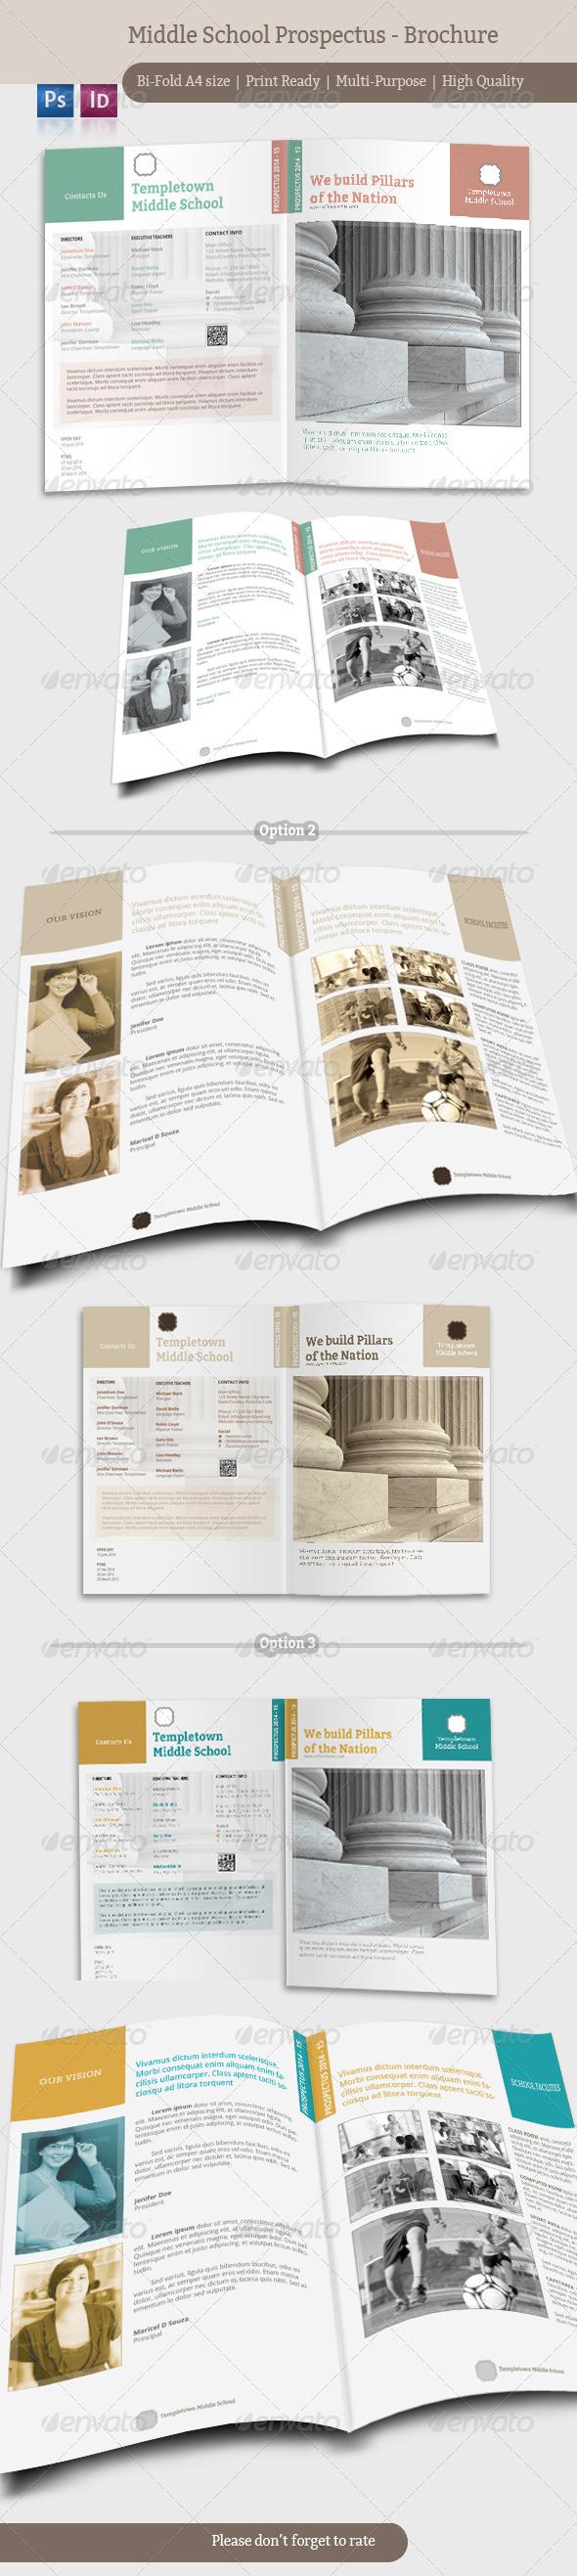 Middle School Prospectus - Brochure  - Brochures Print Templates